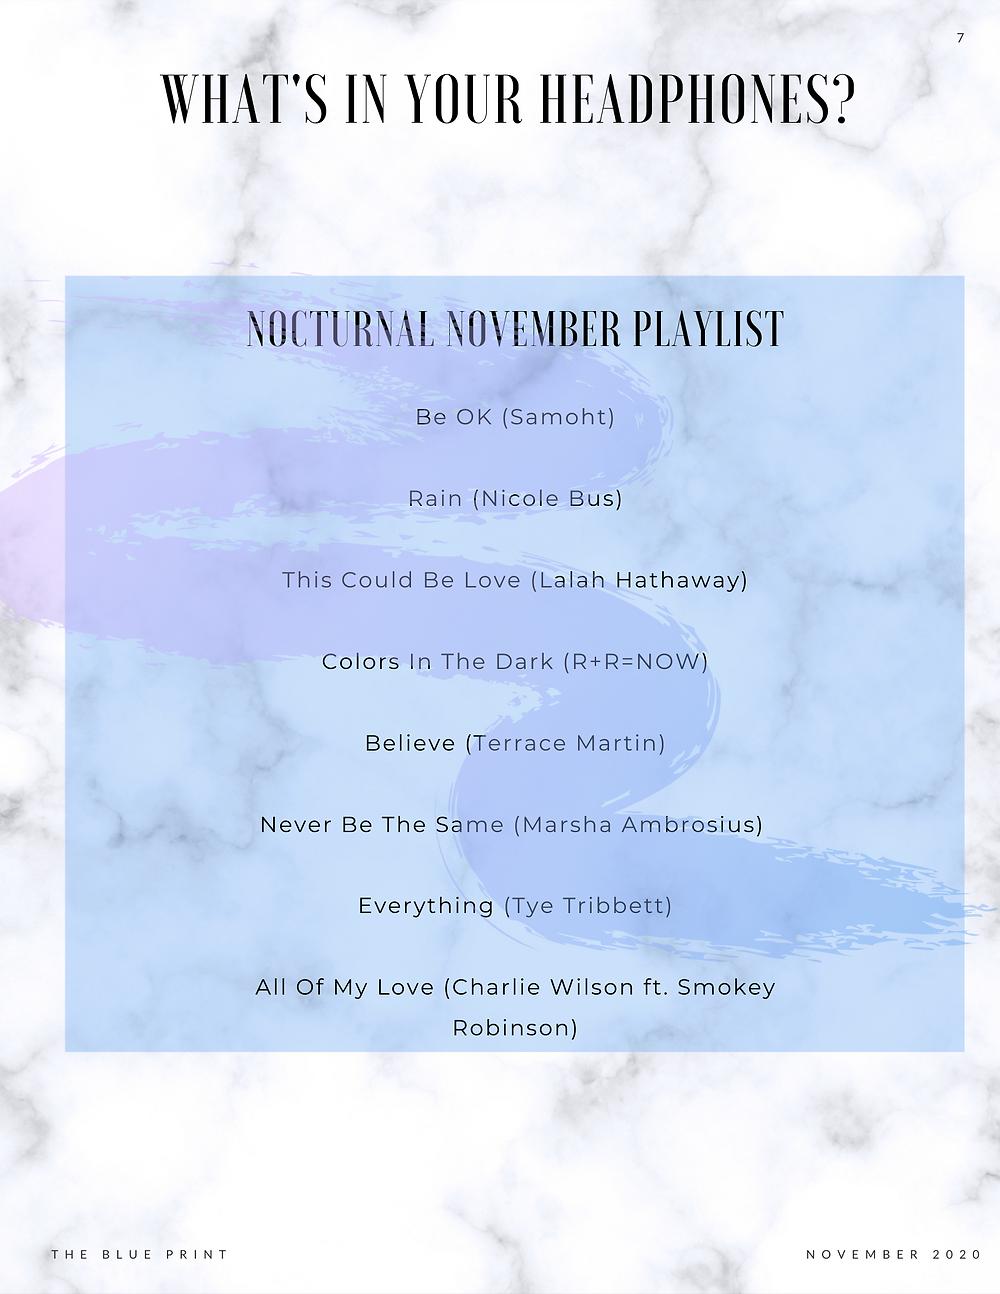 Nocturnal November Playlist